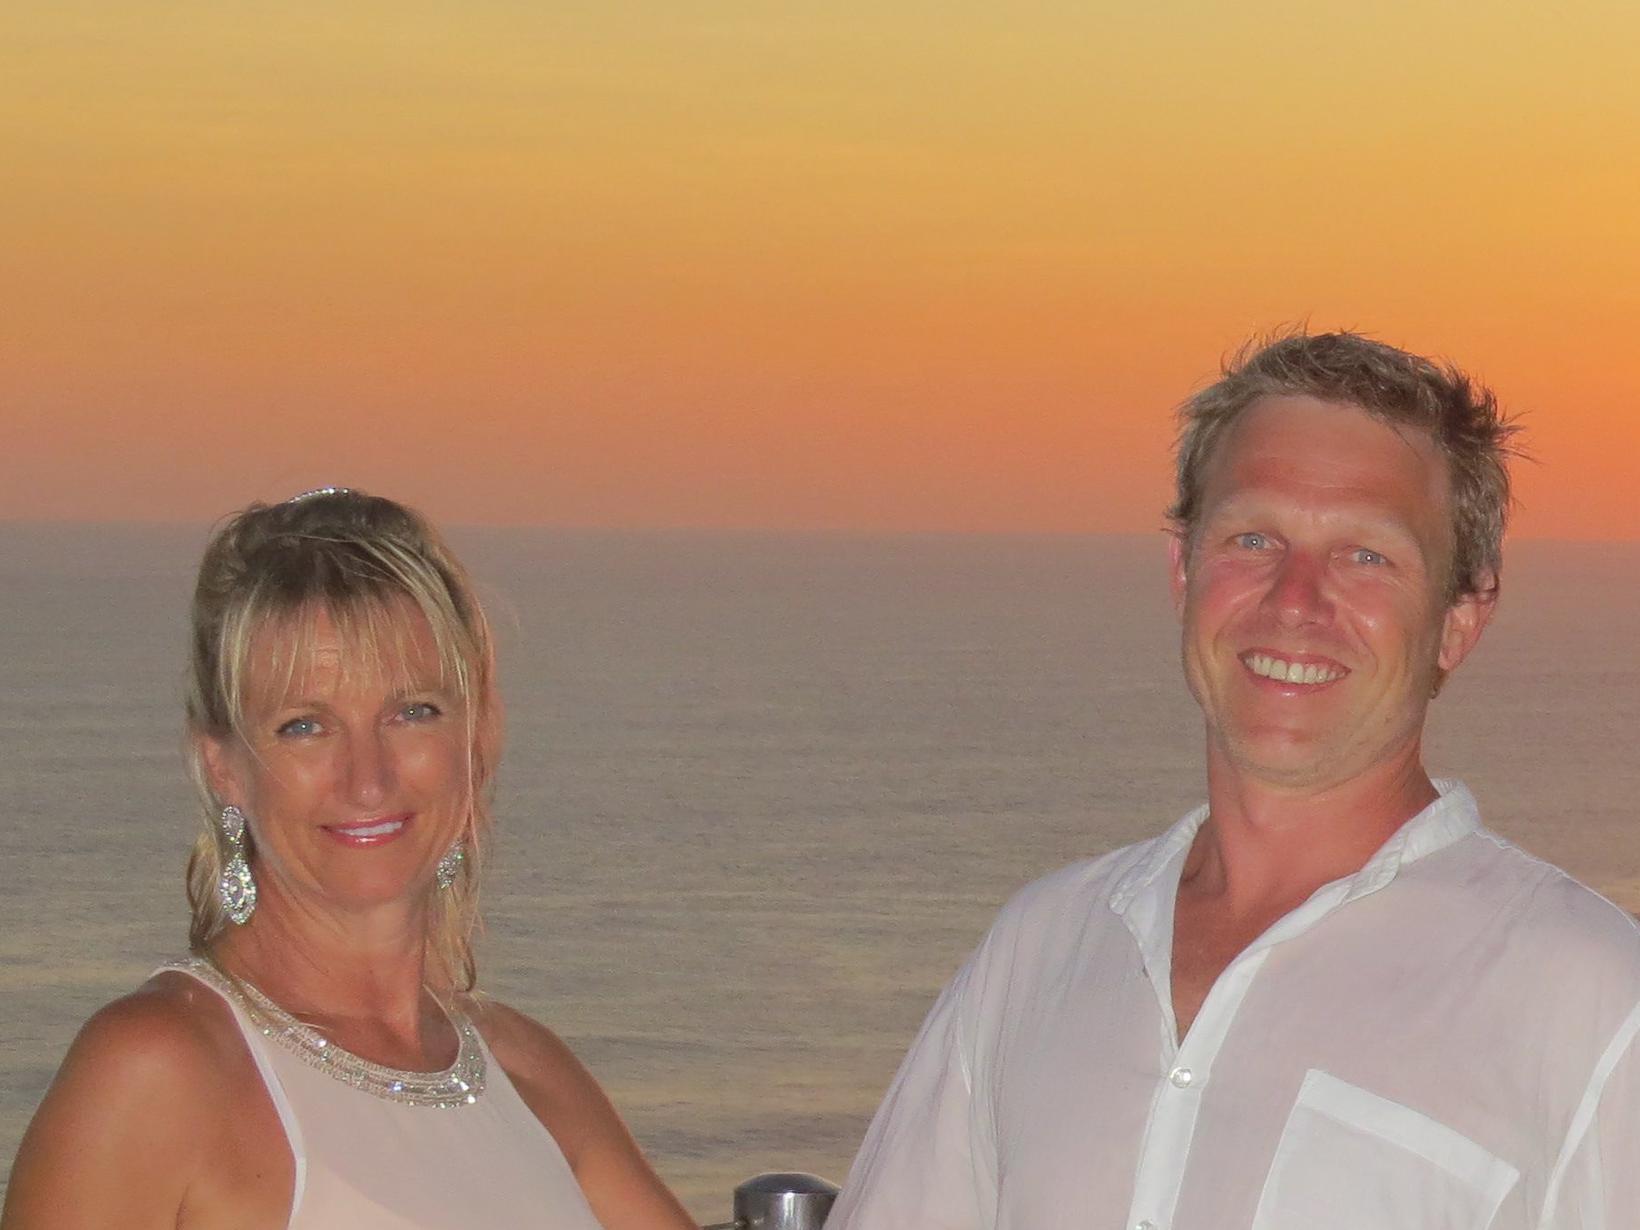 James & Nikki from Noosaville, Queensland, Australia